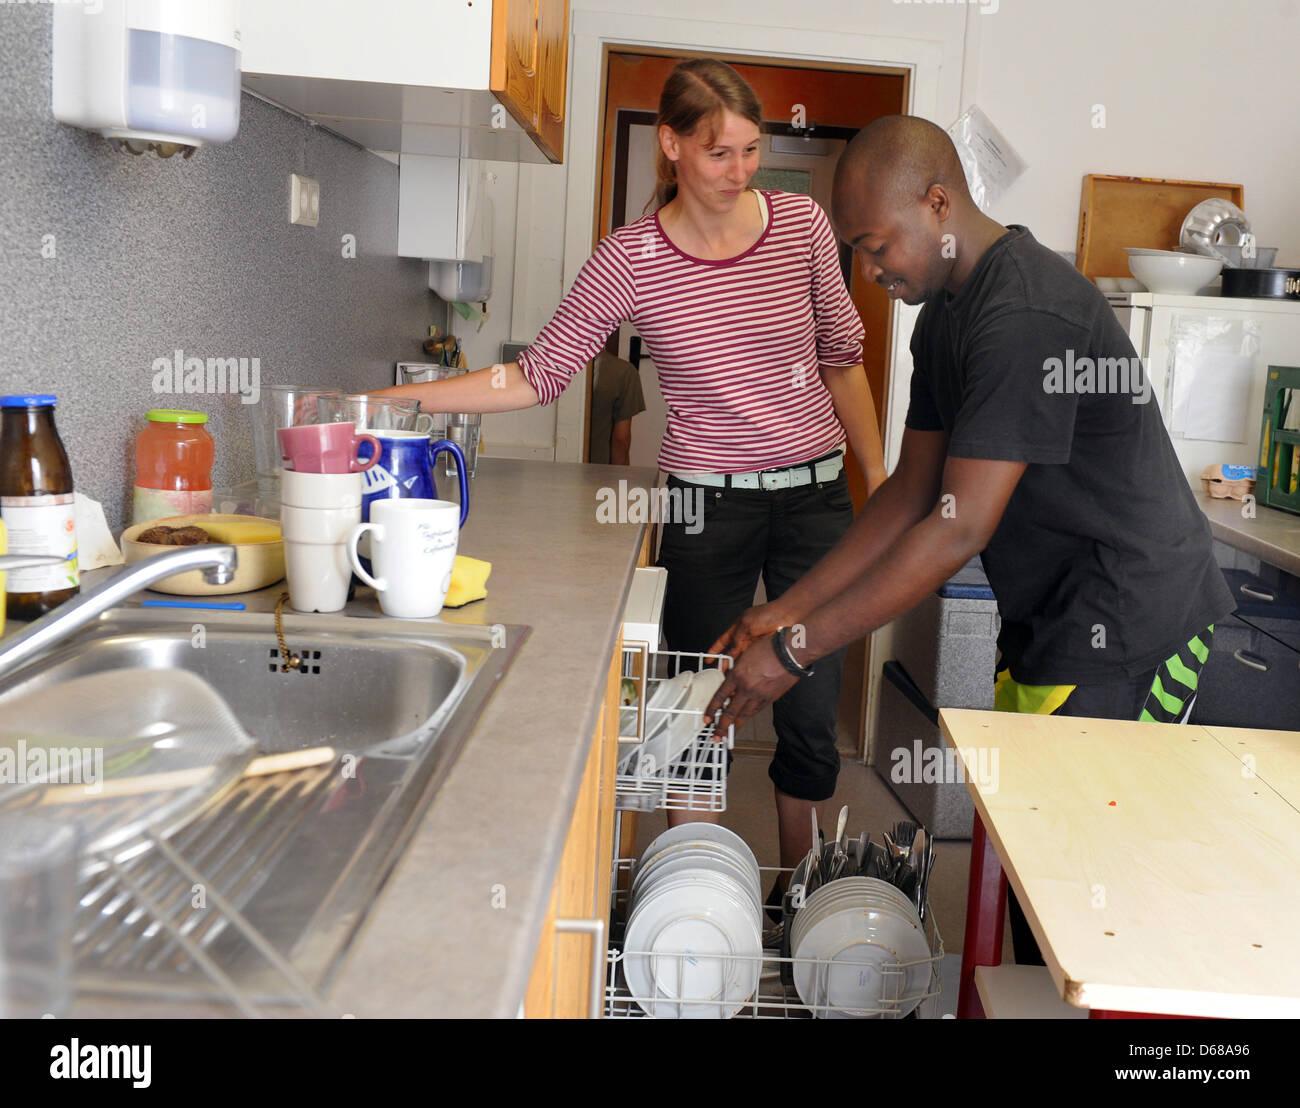 Abduorahmane Seck (R) from Senegal and after-school-care teacher Juliane Pfeffer work in the kitchen at Karl Schubert Stock Photo